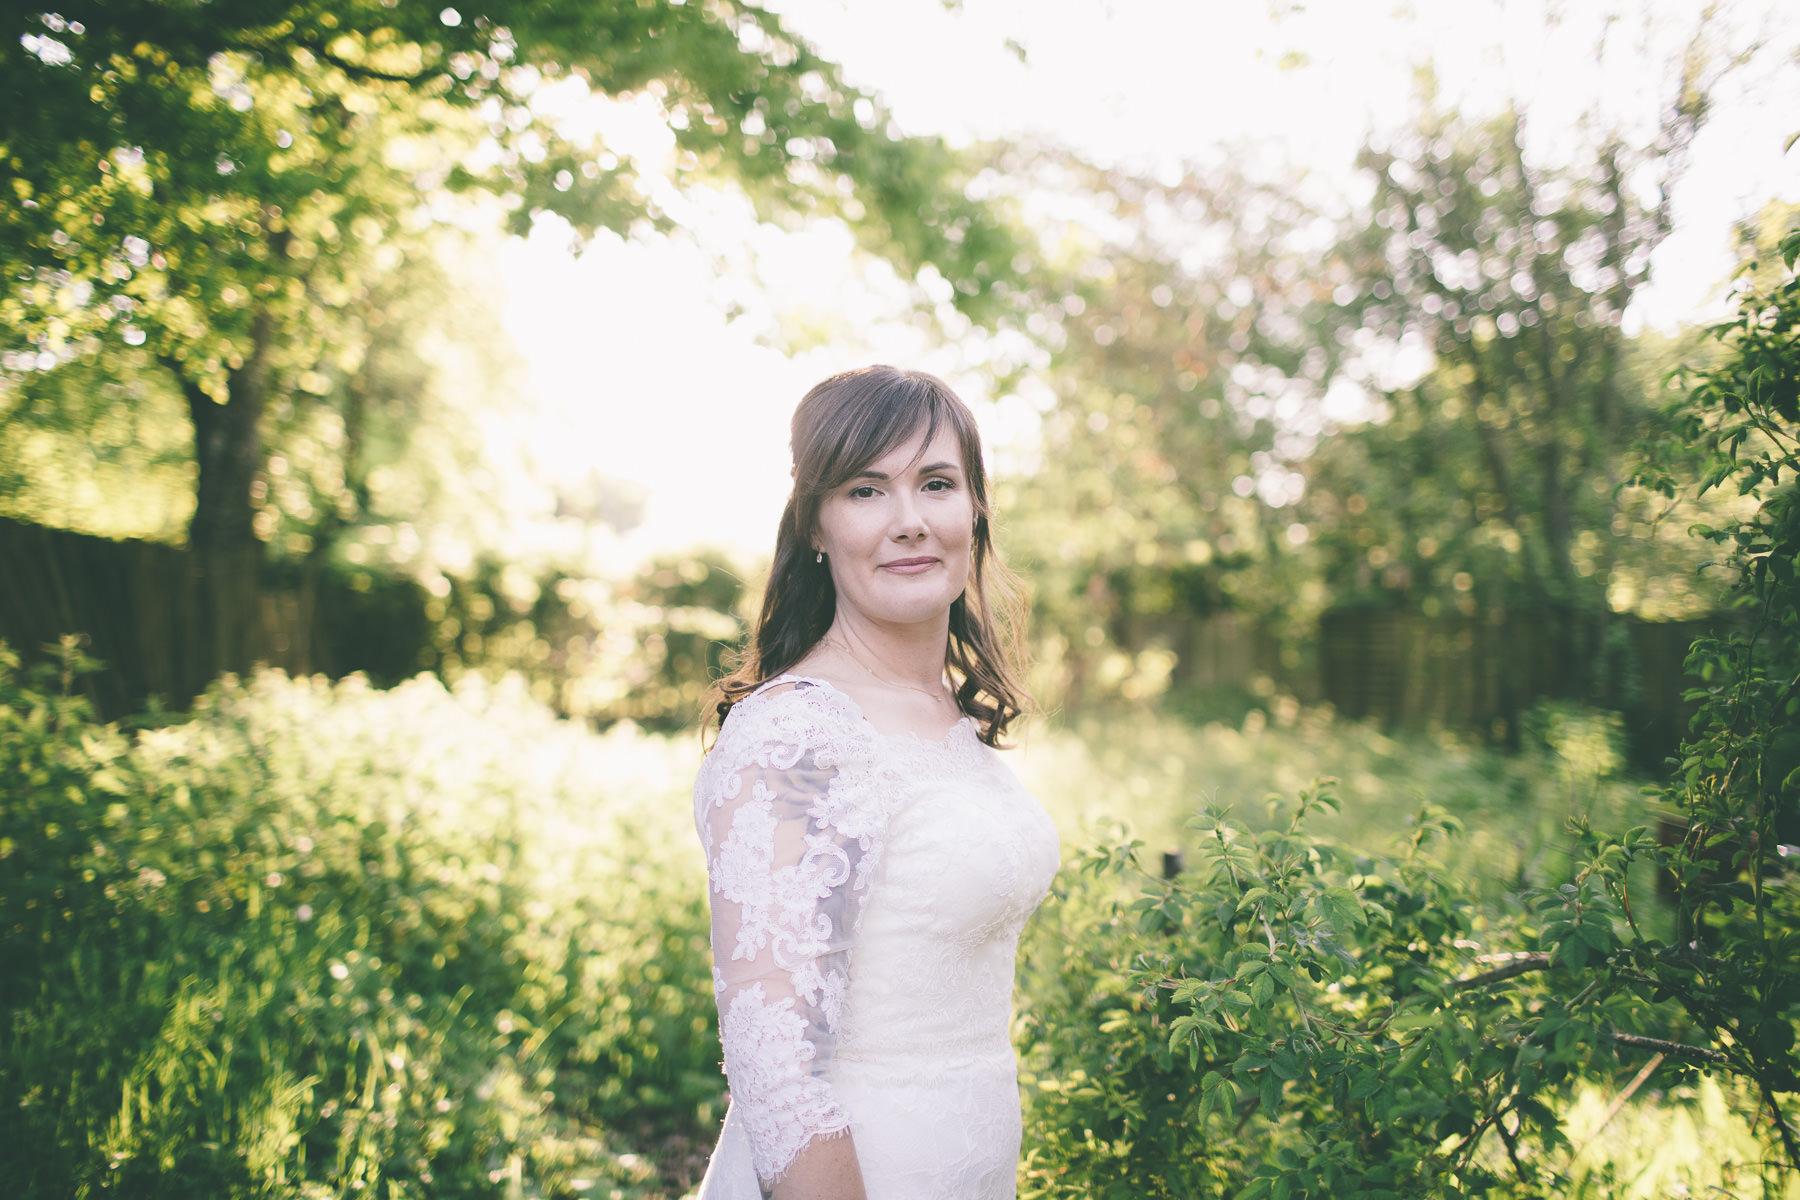 Pamber-Place-wedding-photography-basingstoke-hampshire-199